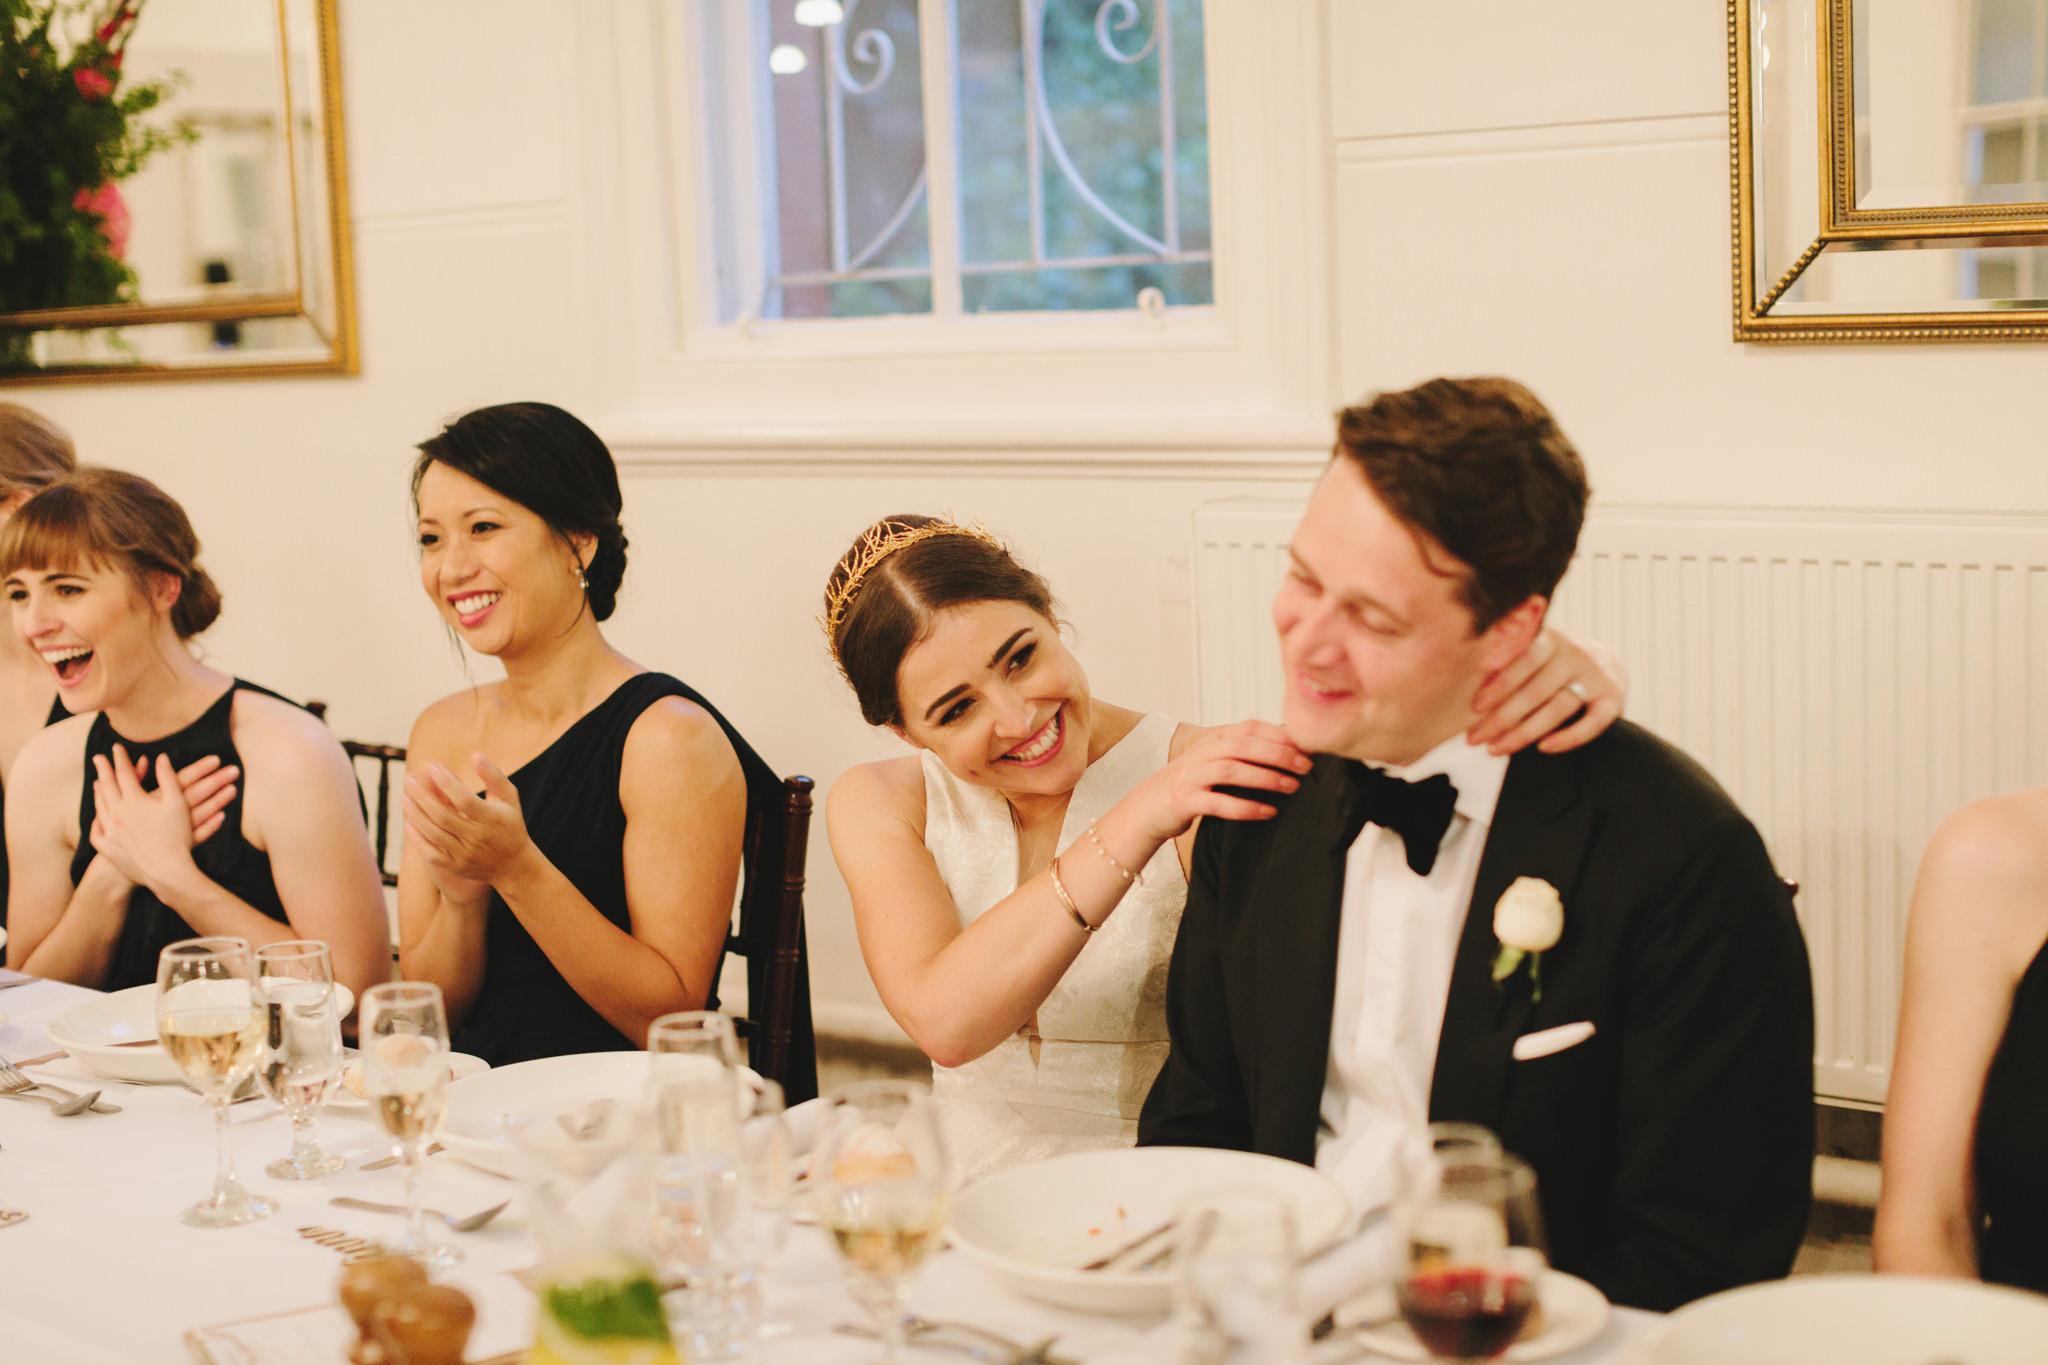 Abbotsford_Convent_Wedding_Peter_Anna110.JPG